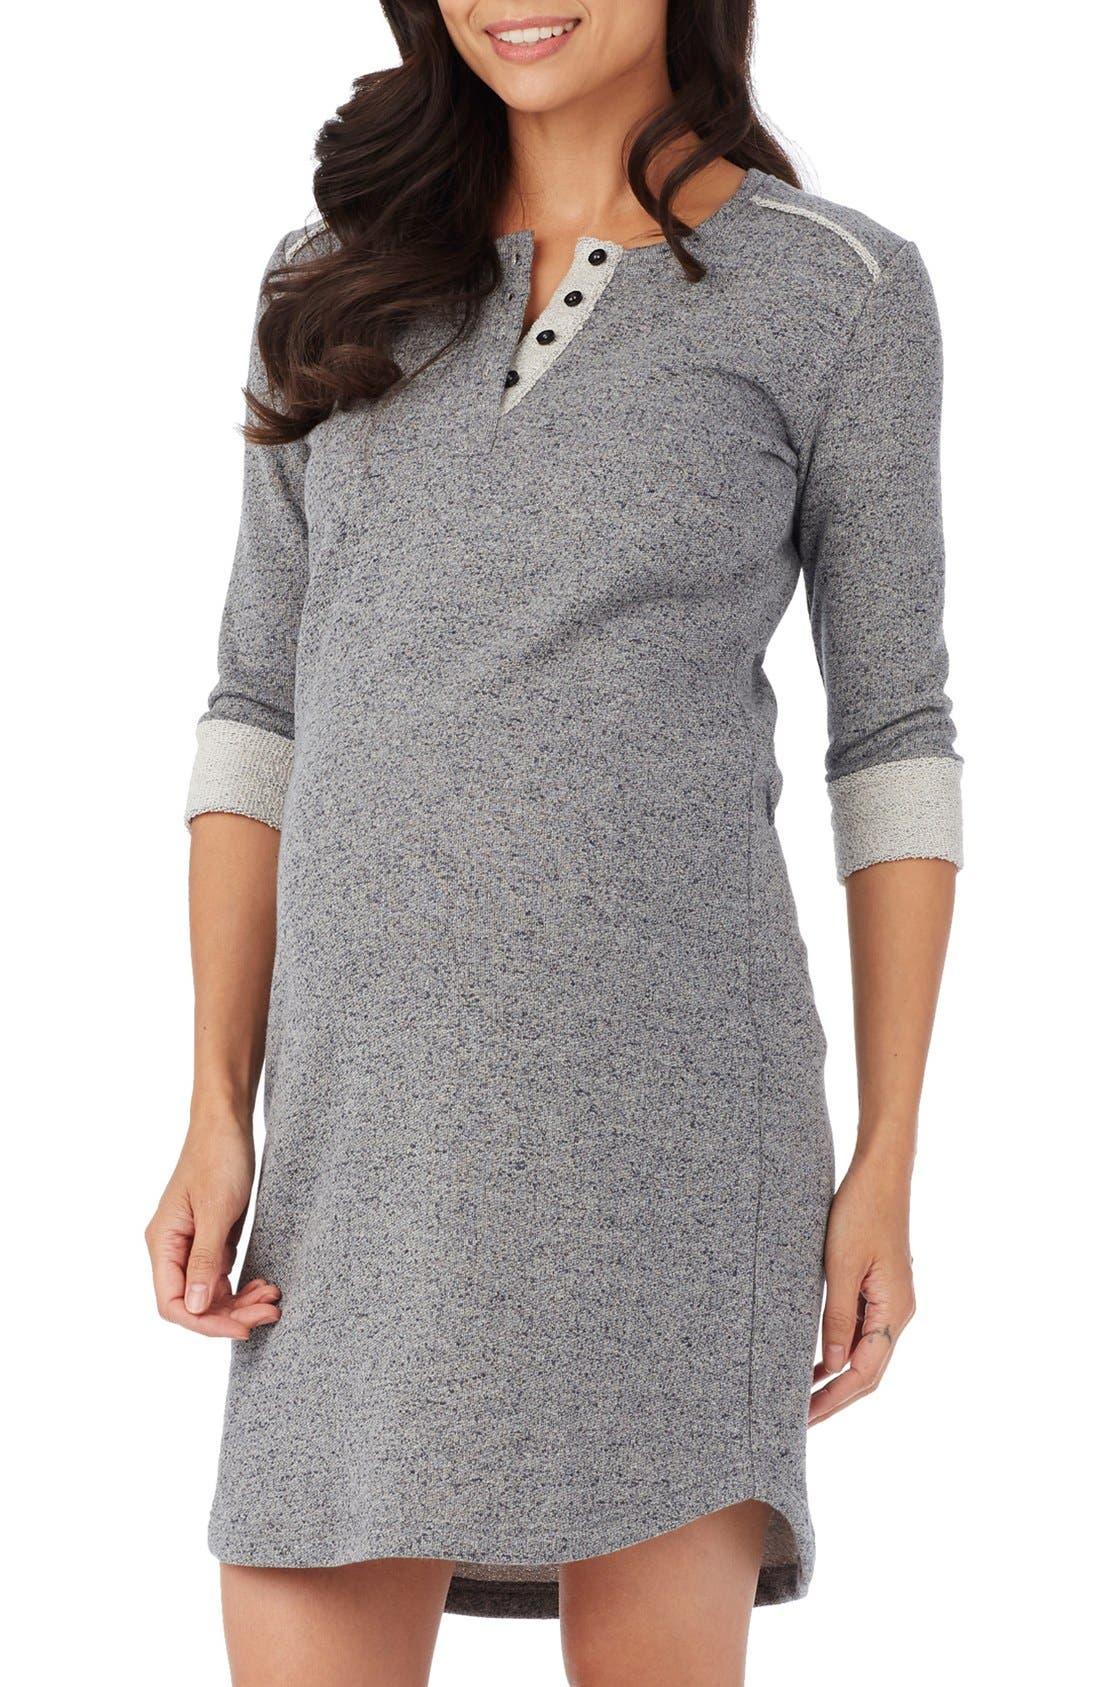 Rosie Pope 'Reese' Henley Maternity Dress